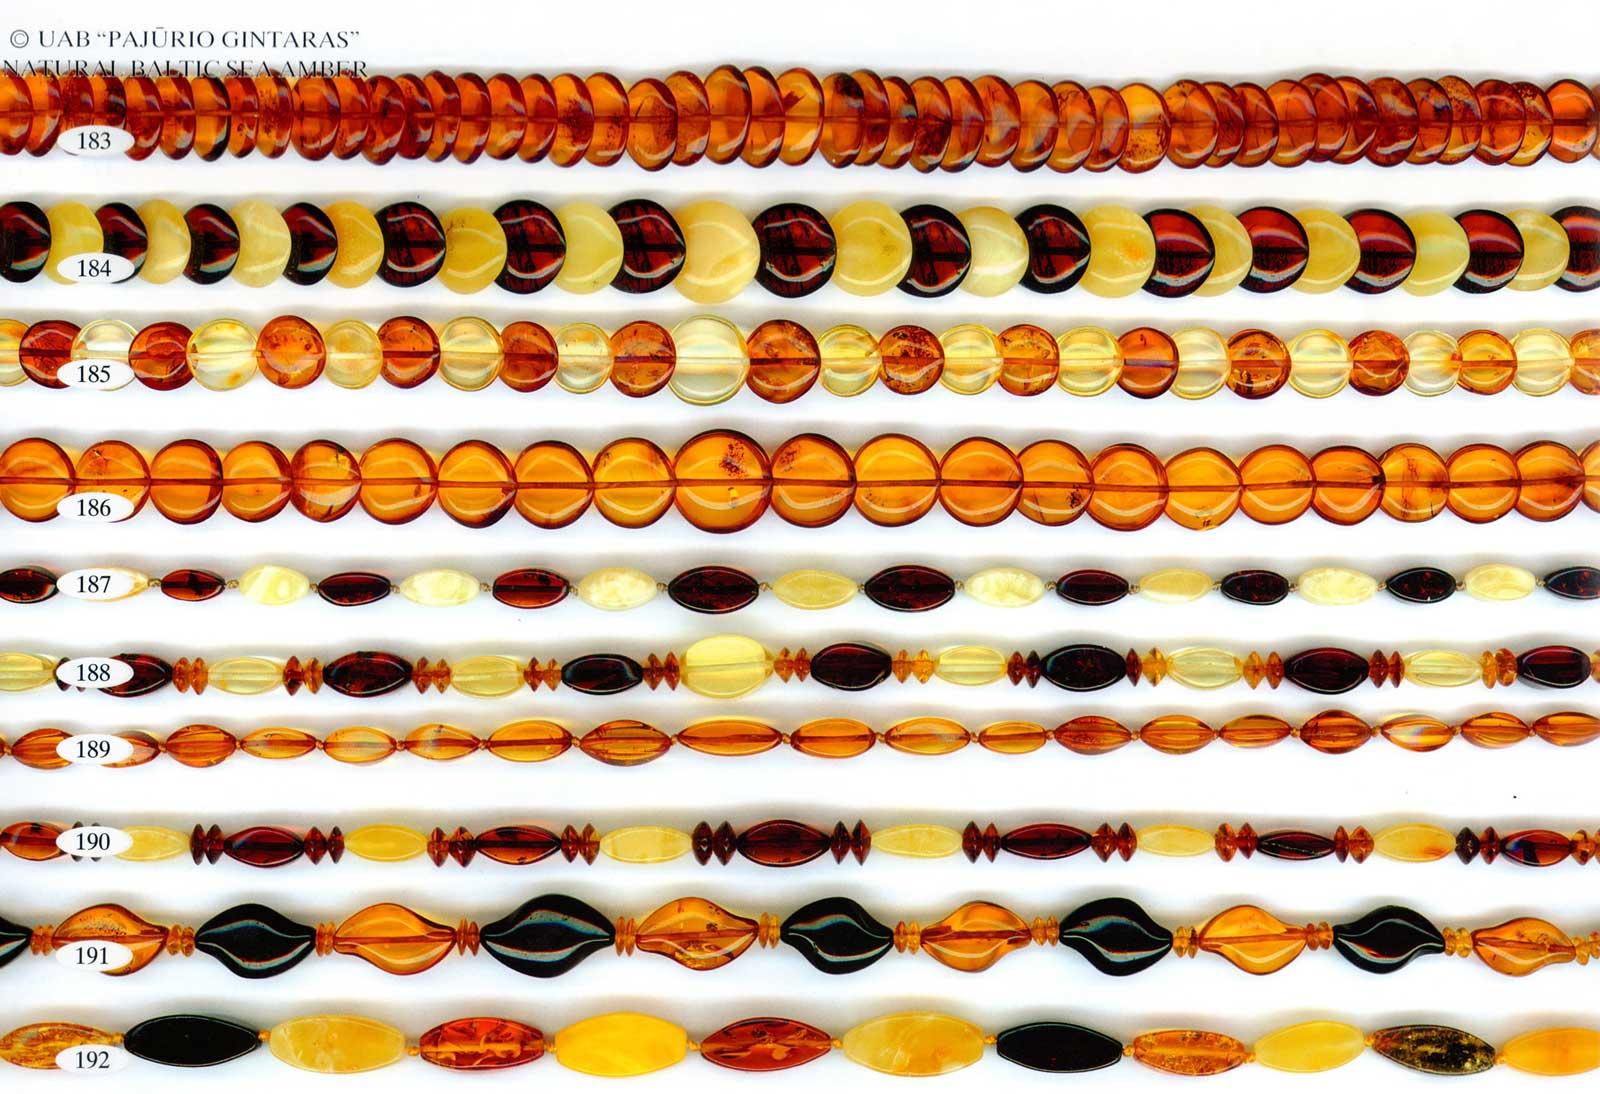 183-192 bernsteinkette großhandel